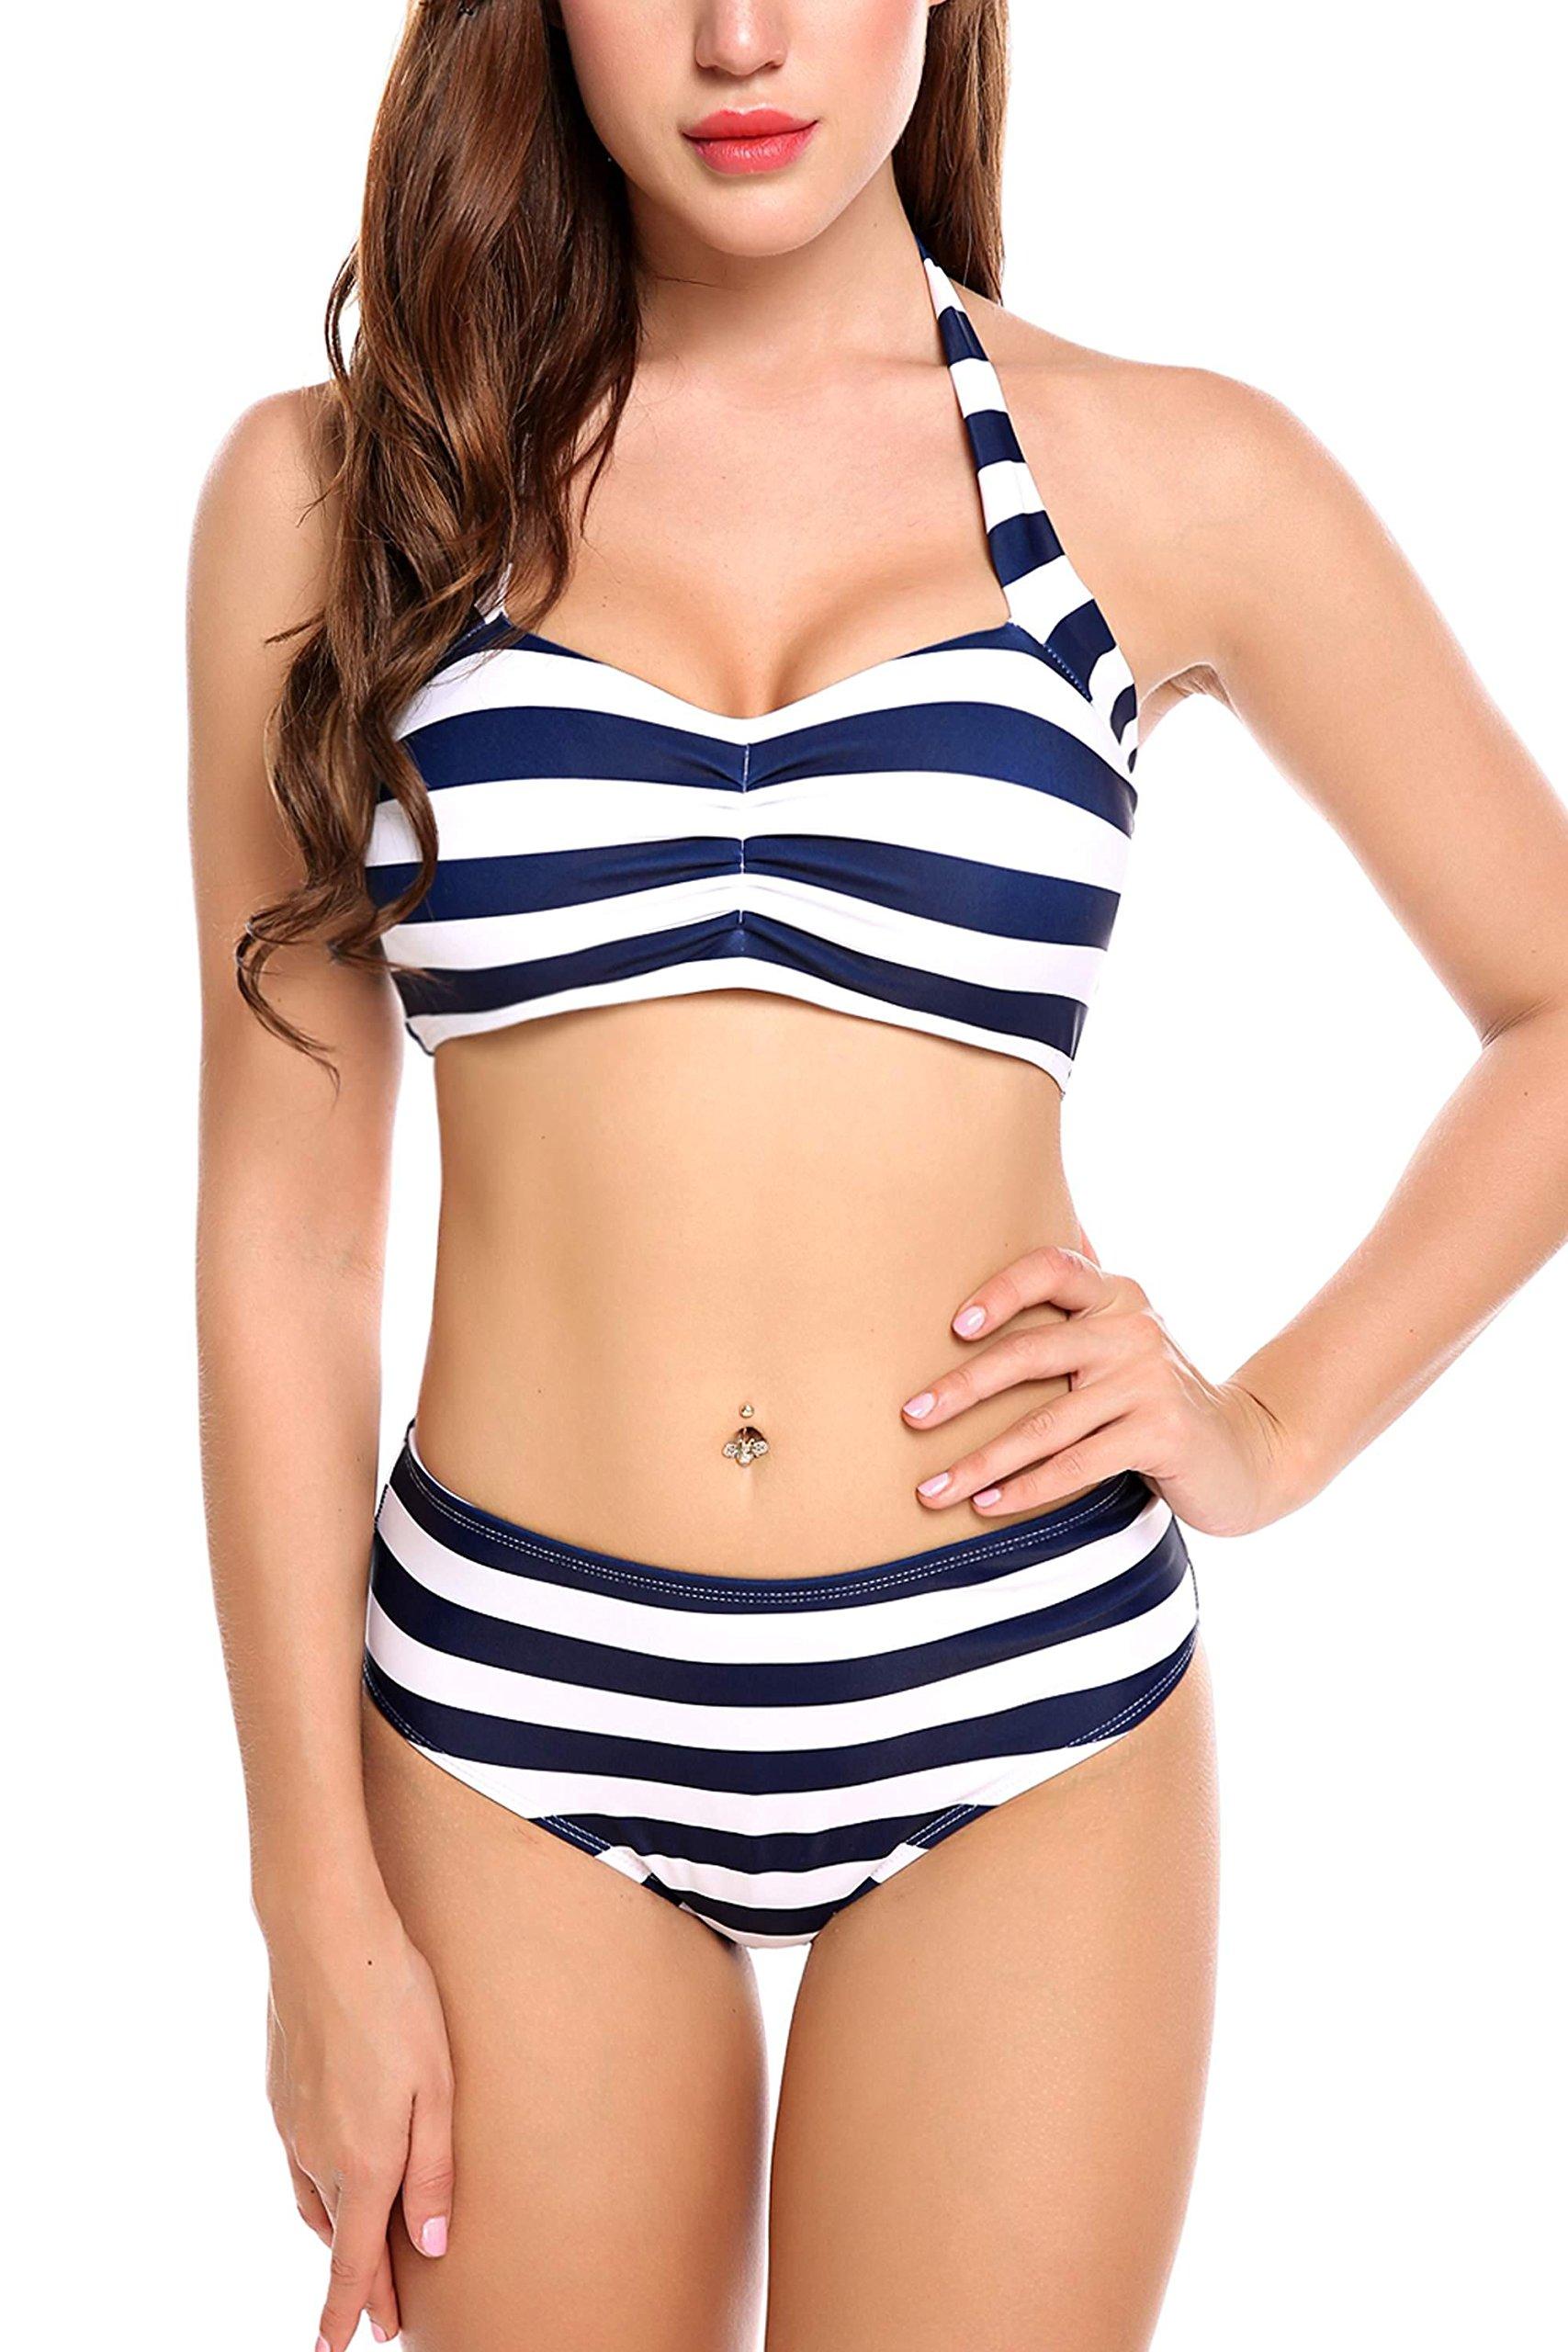 ADOME Women High Waisted Swimwear Push up Bikini Set Halter Underwired Swimsuits, Style 1-navy Blue, Large